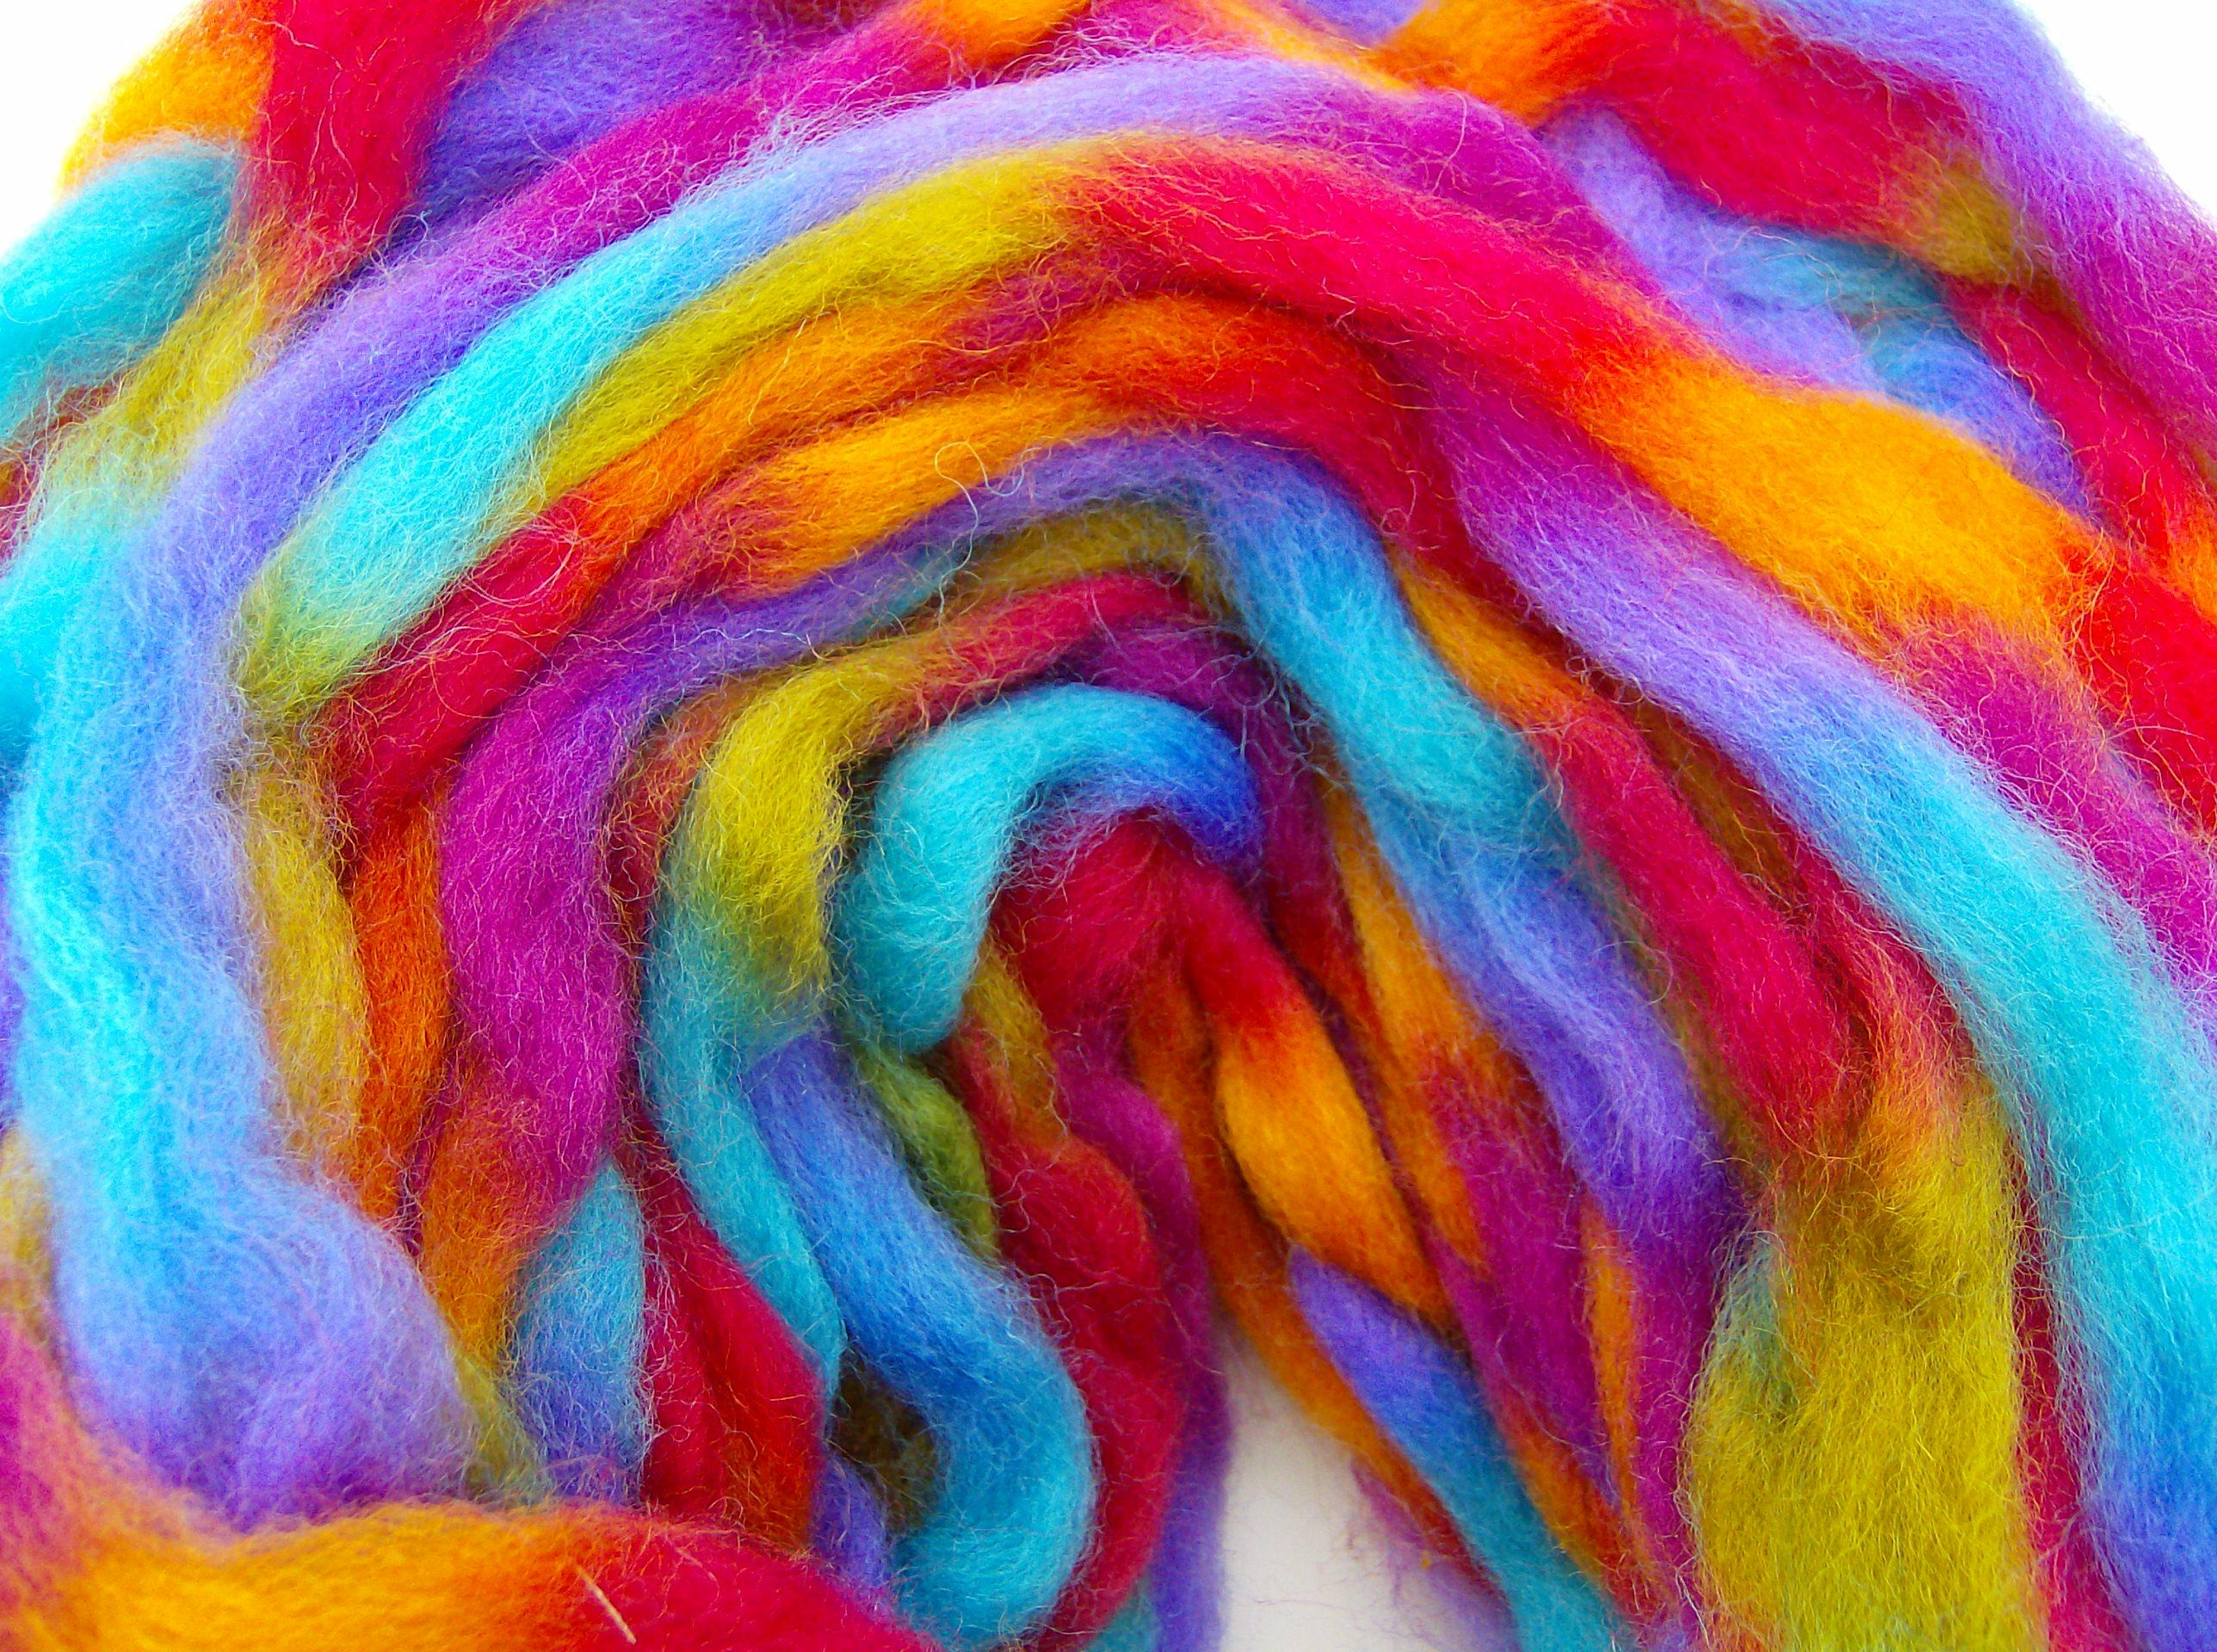 Some of my wool sliver to destash